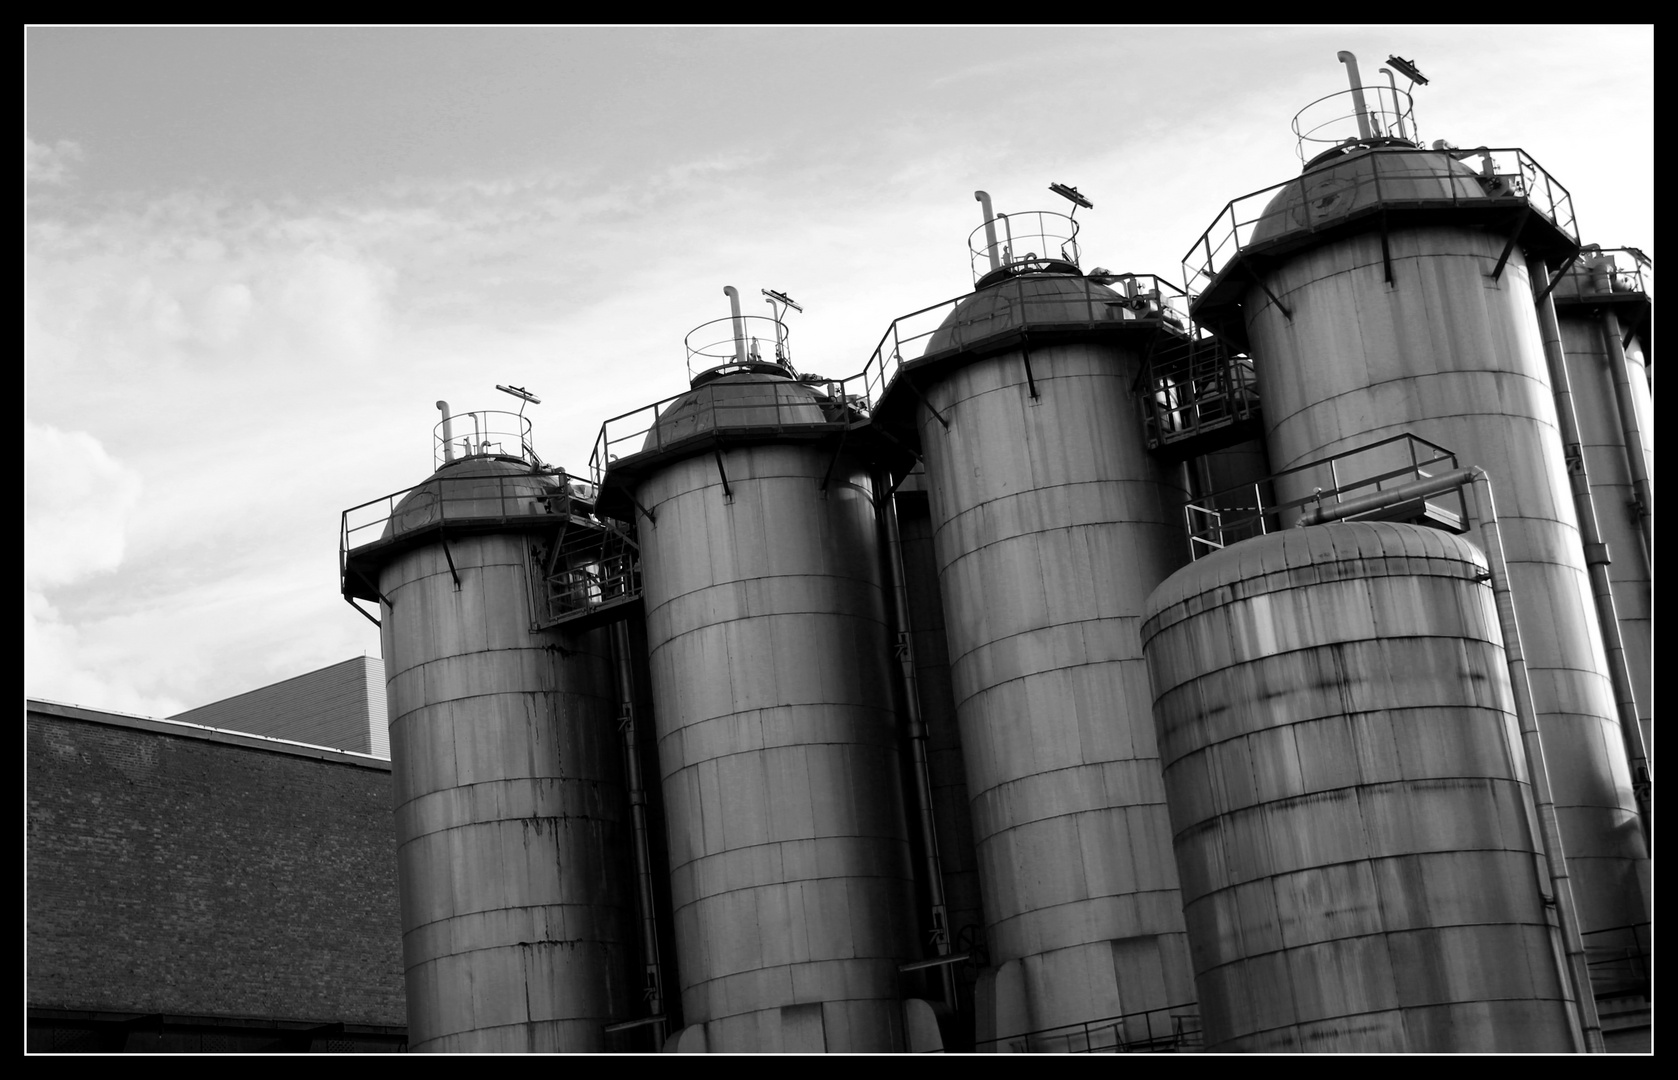 Kraftwerk Reuter